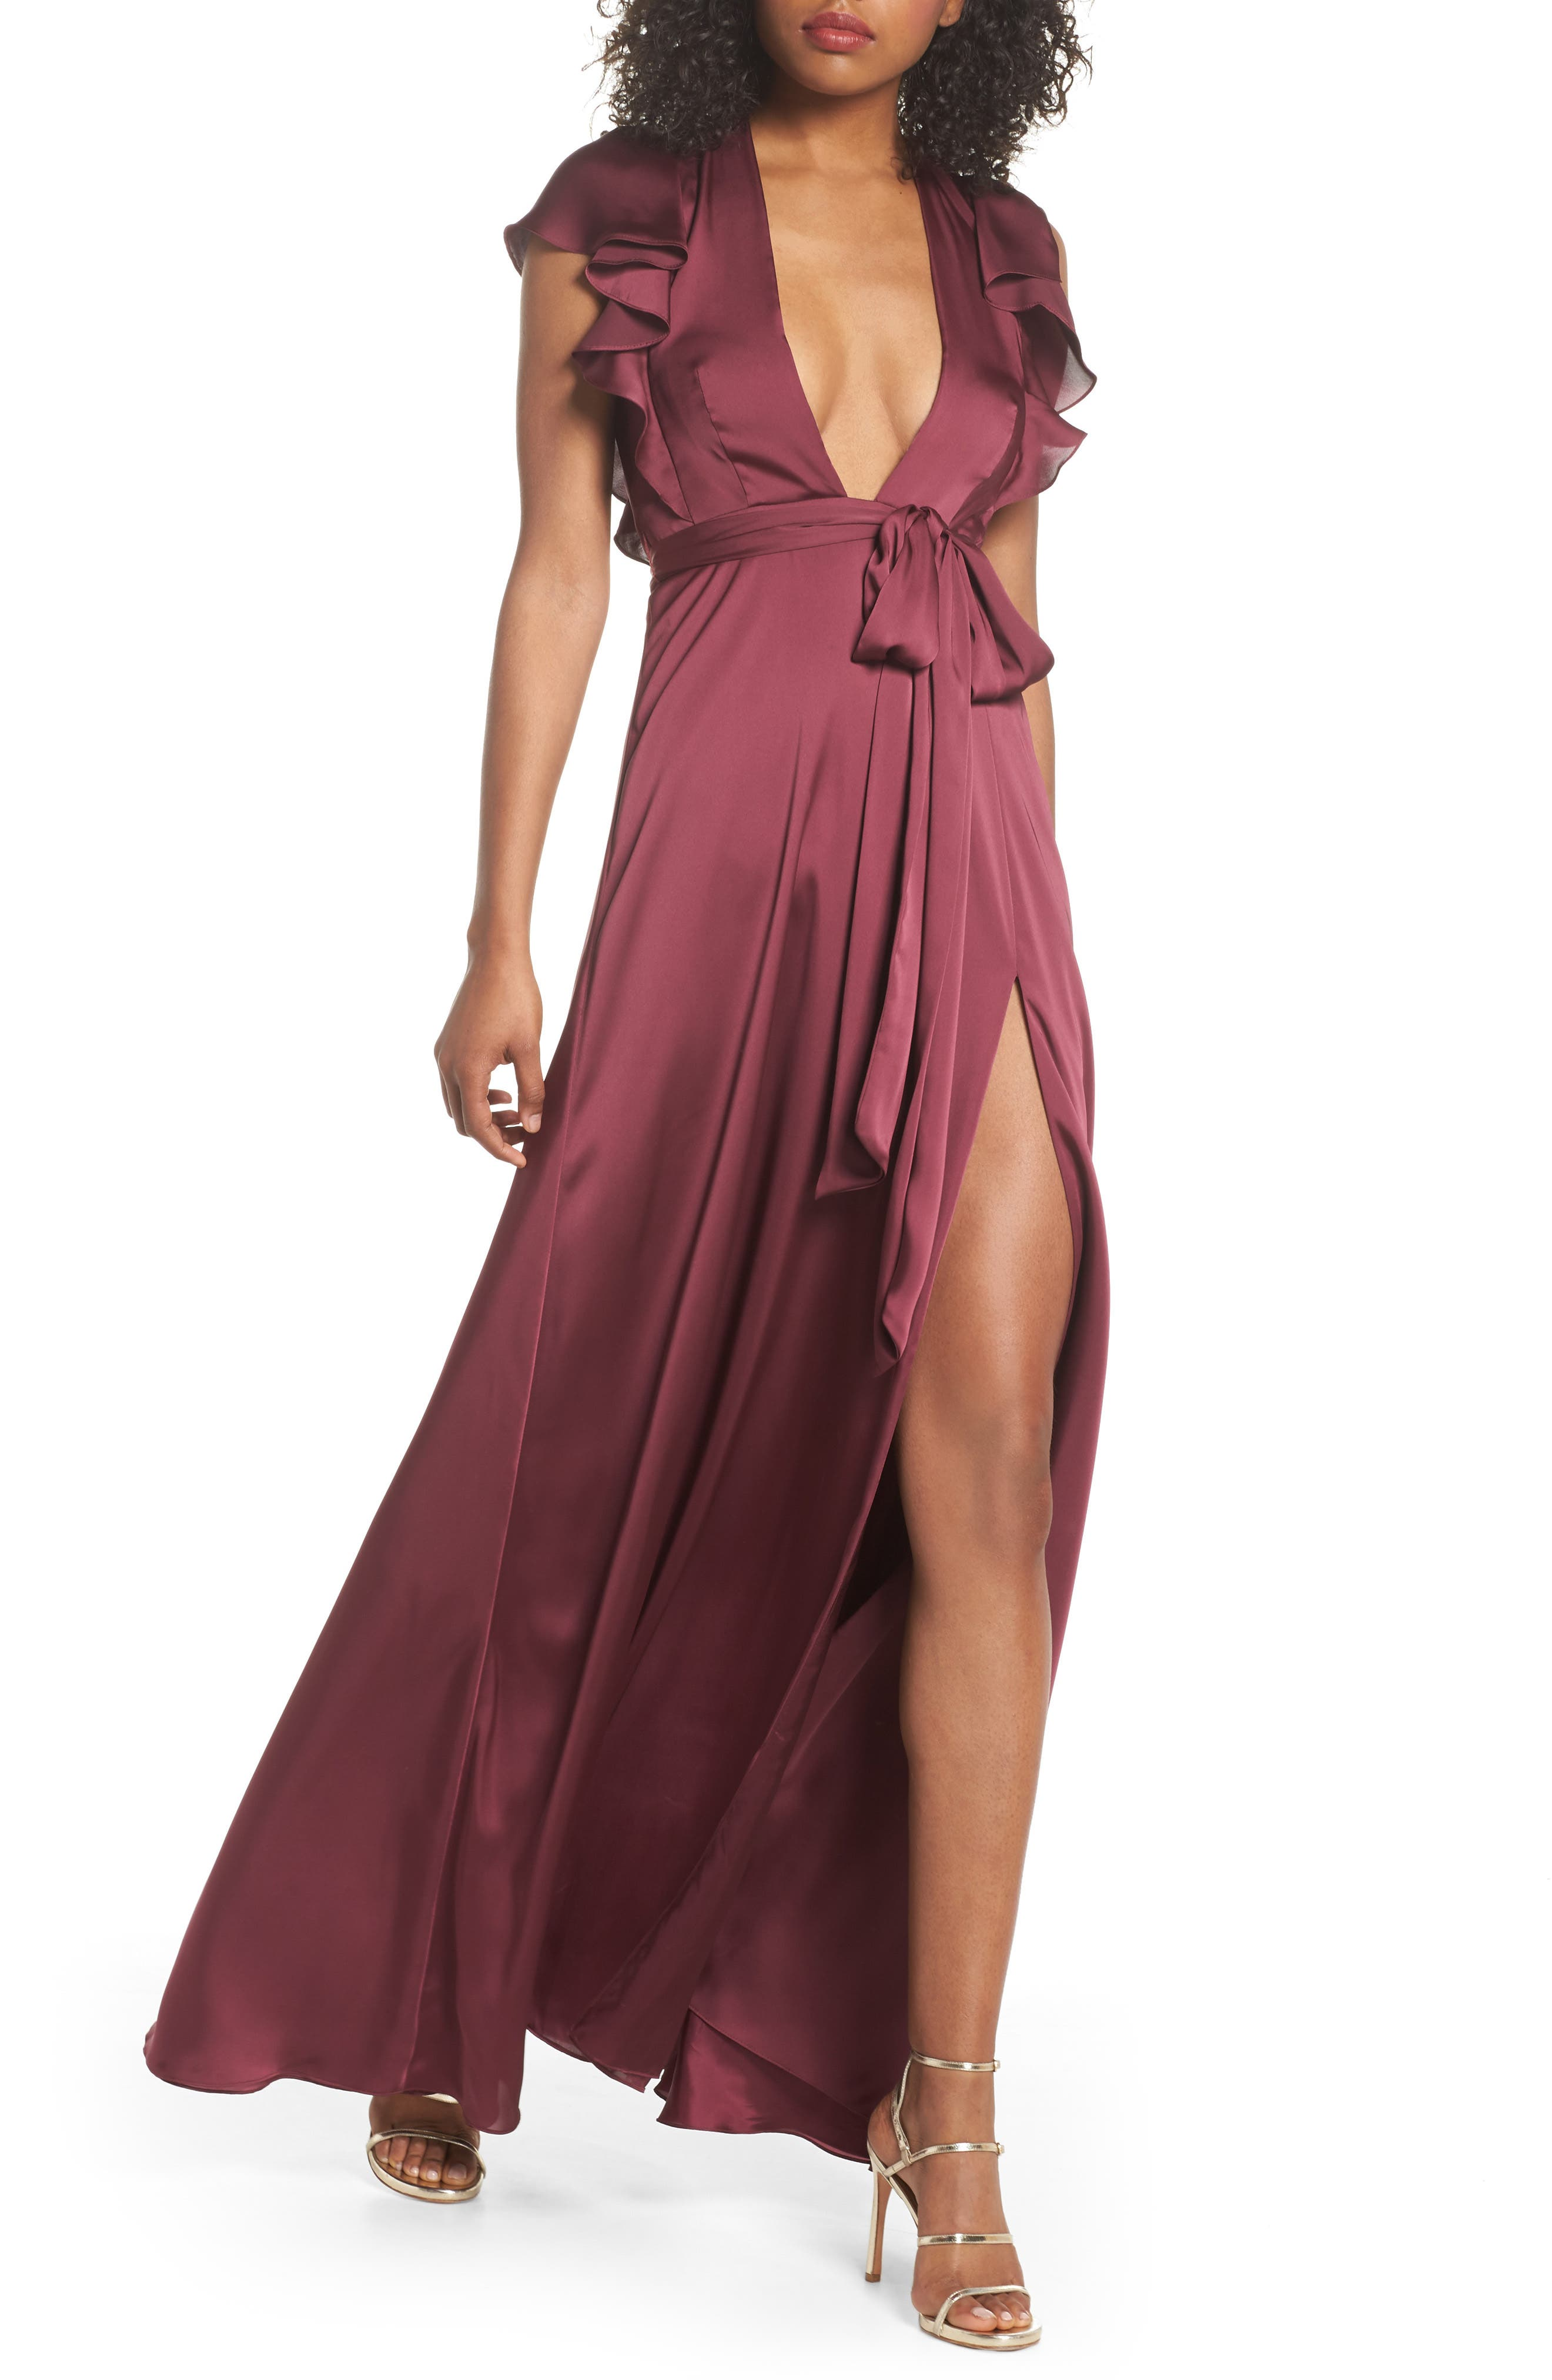 Jill Jill Stuart Ruffle Sleeve Gown